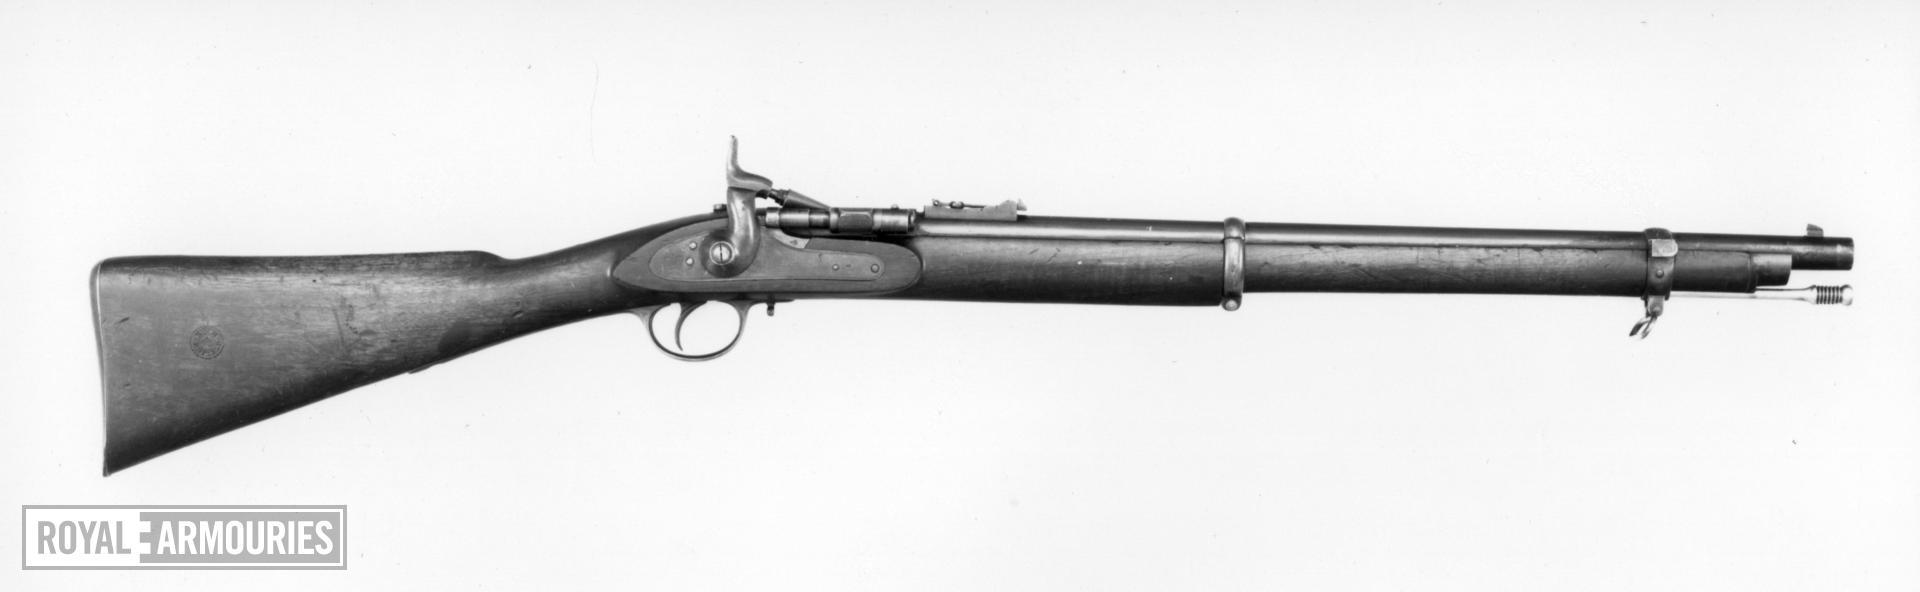 Centrefire breech-loading military carbine - Snider pattern